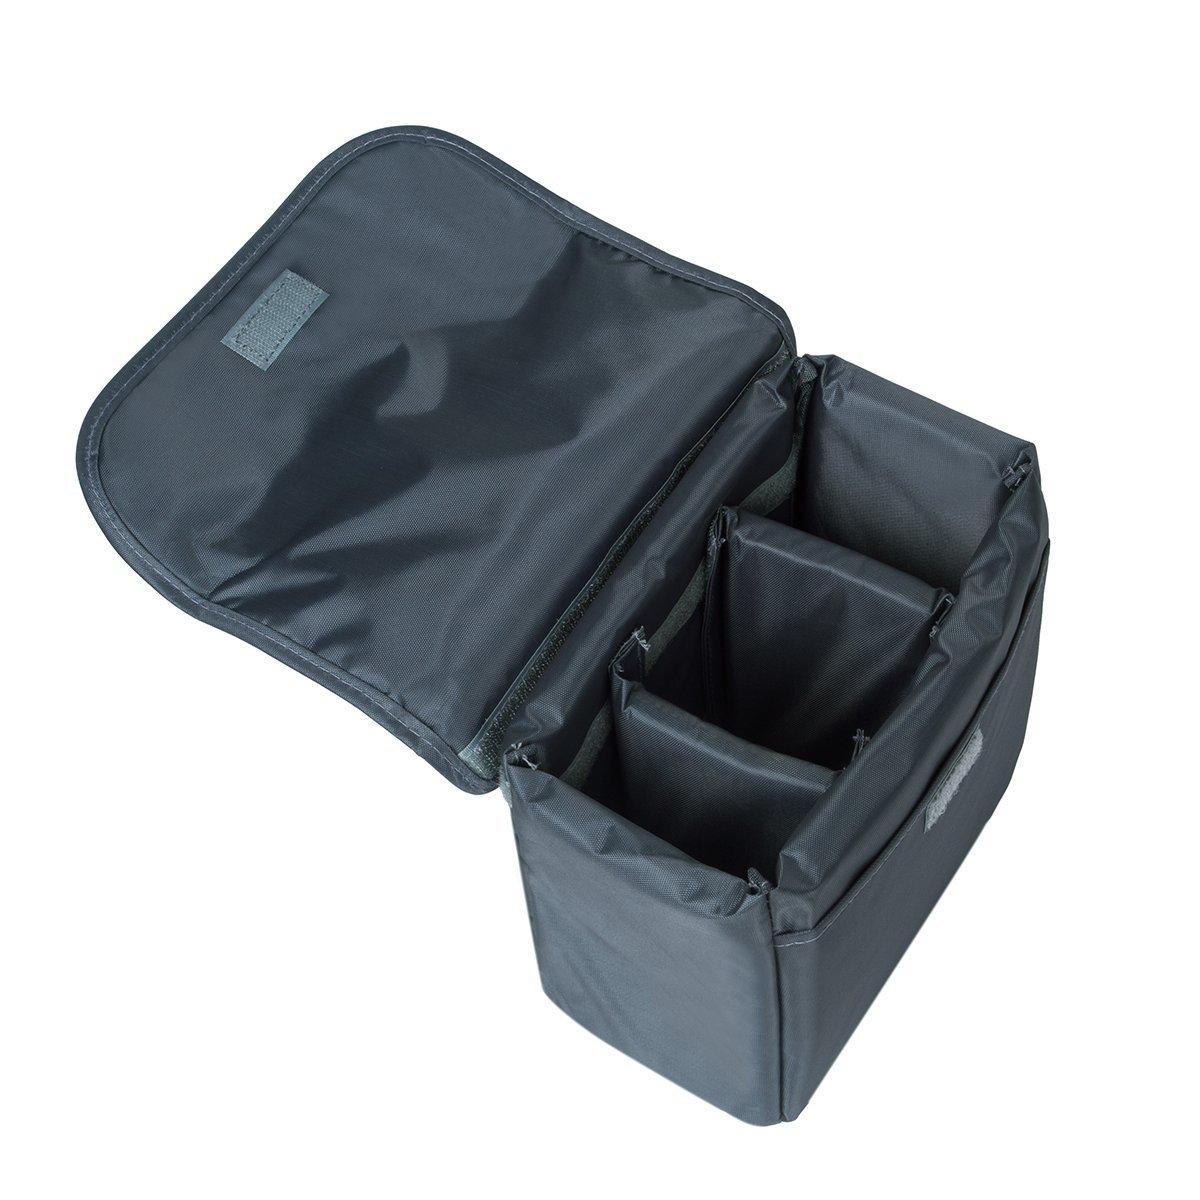 G-raphy Camera Insert Camera Bag for All DSLR SLR Cameras (Small)